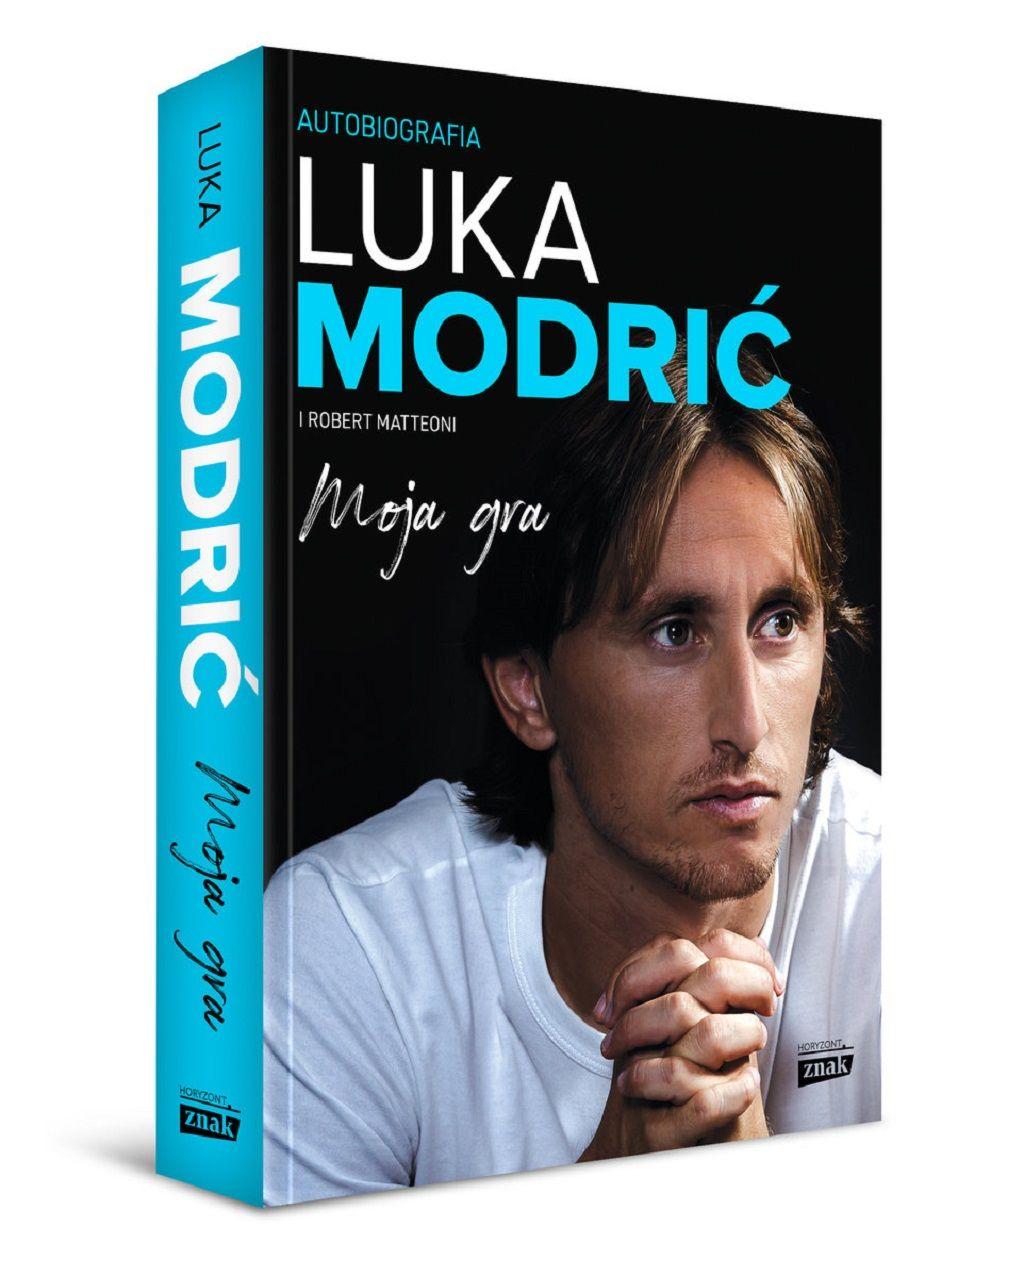 Luka Modrić, Robert Matteoni – Moja gra. Autobiografia